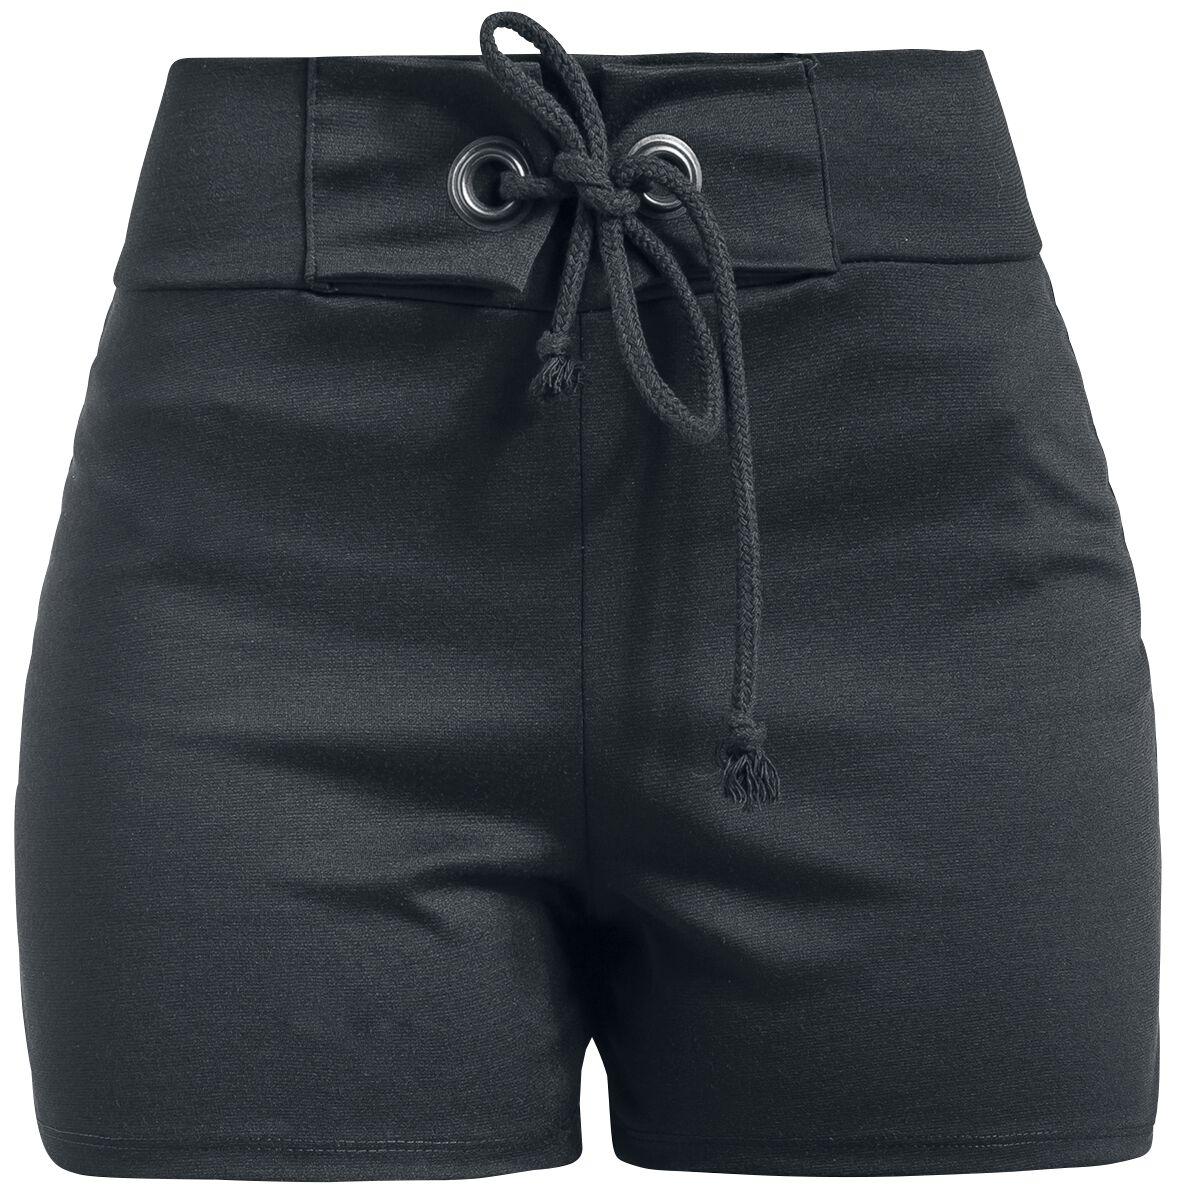 Image of   Outer Vision Cloe High Waist Short Girlie shorts sort